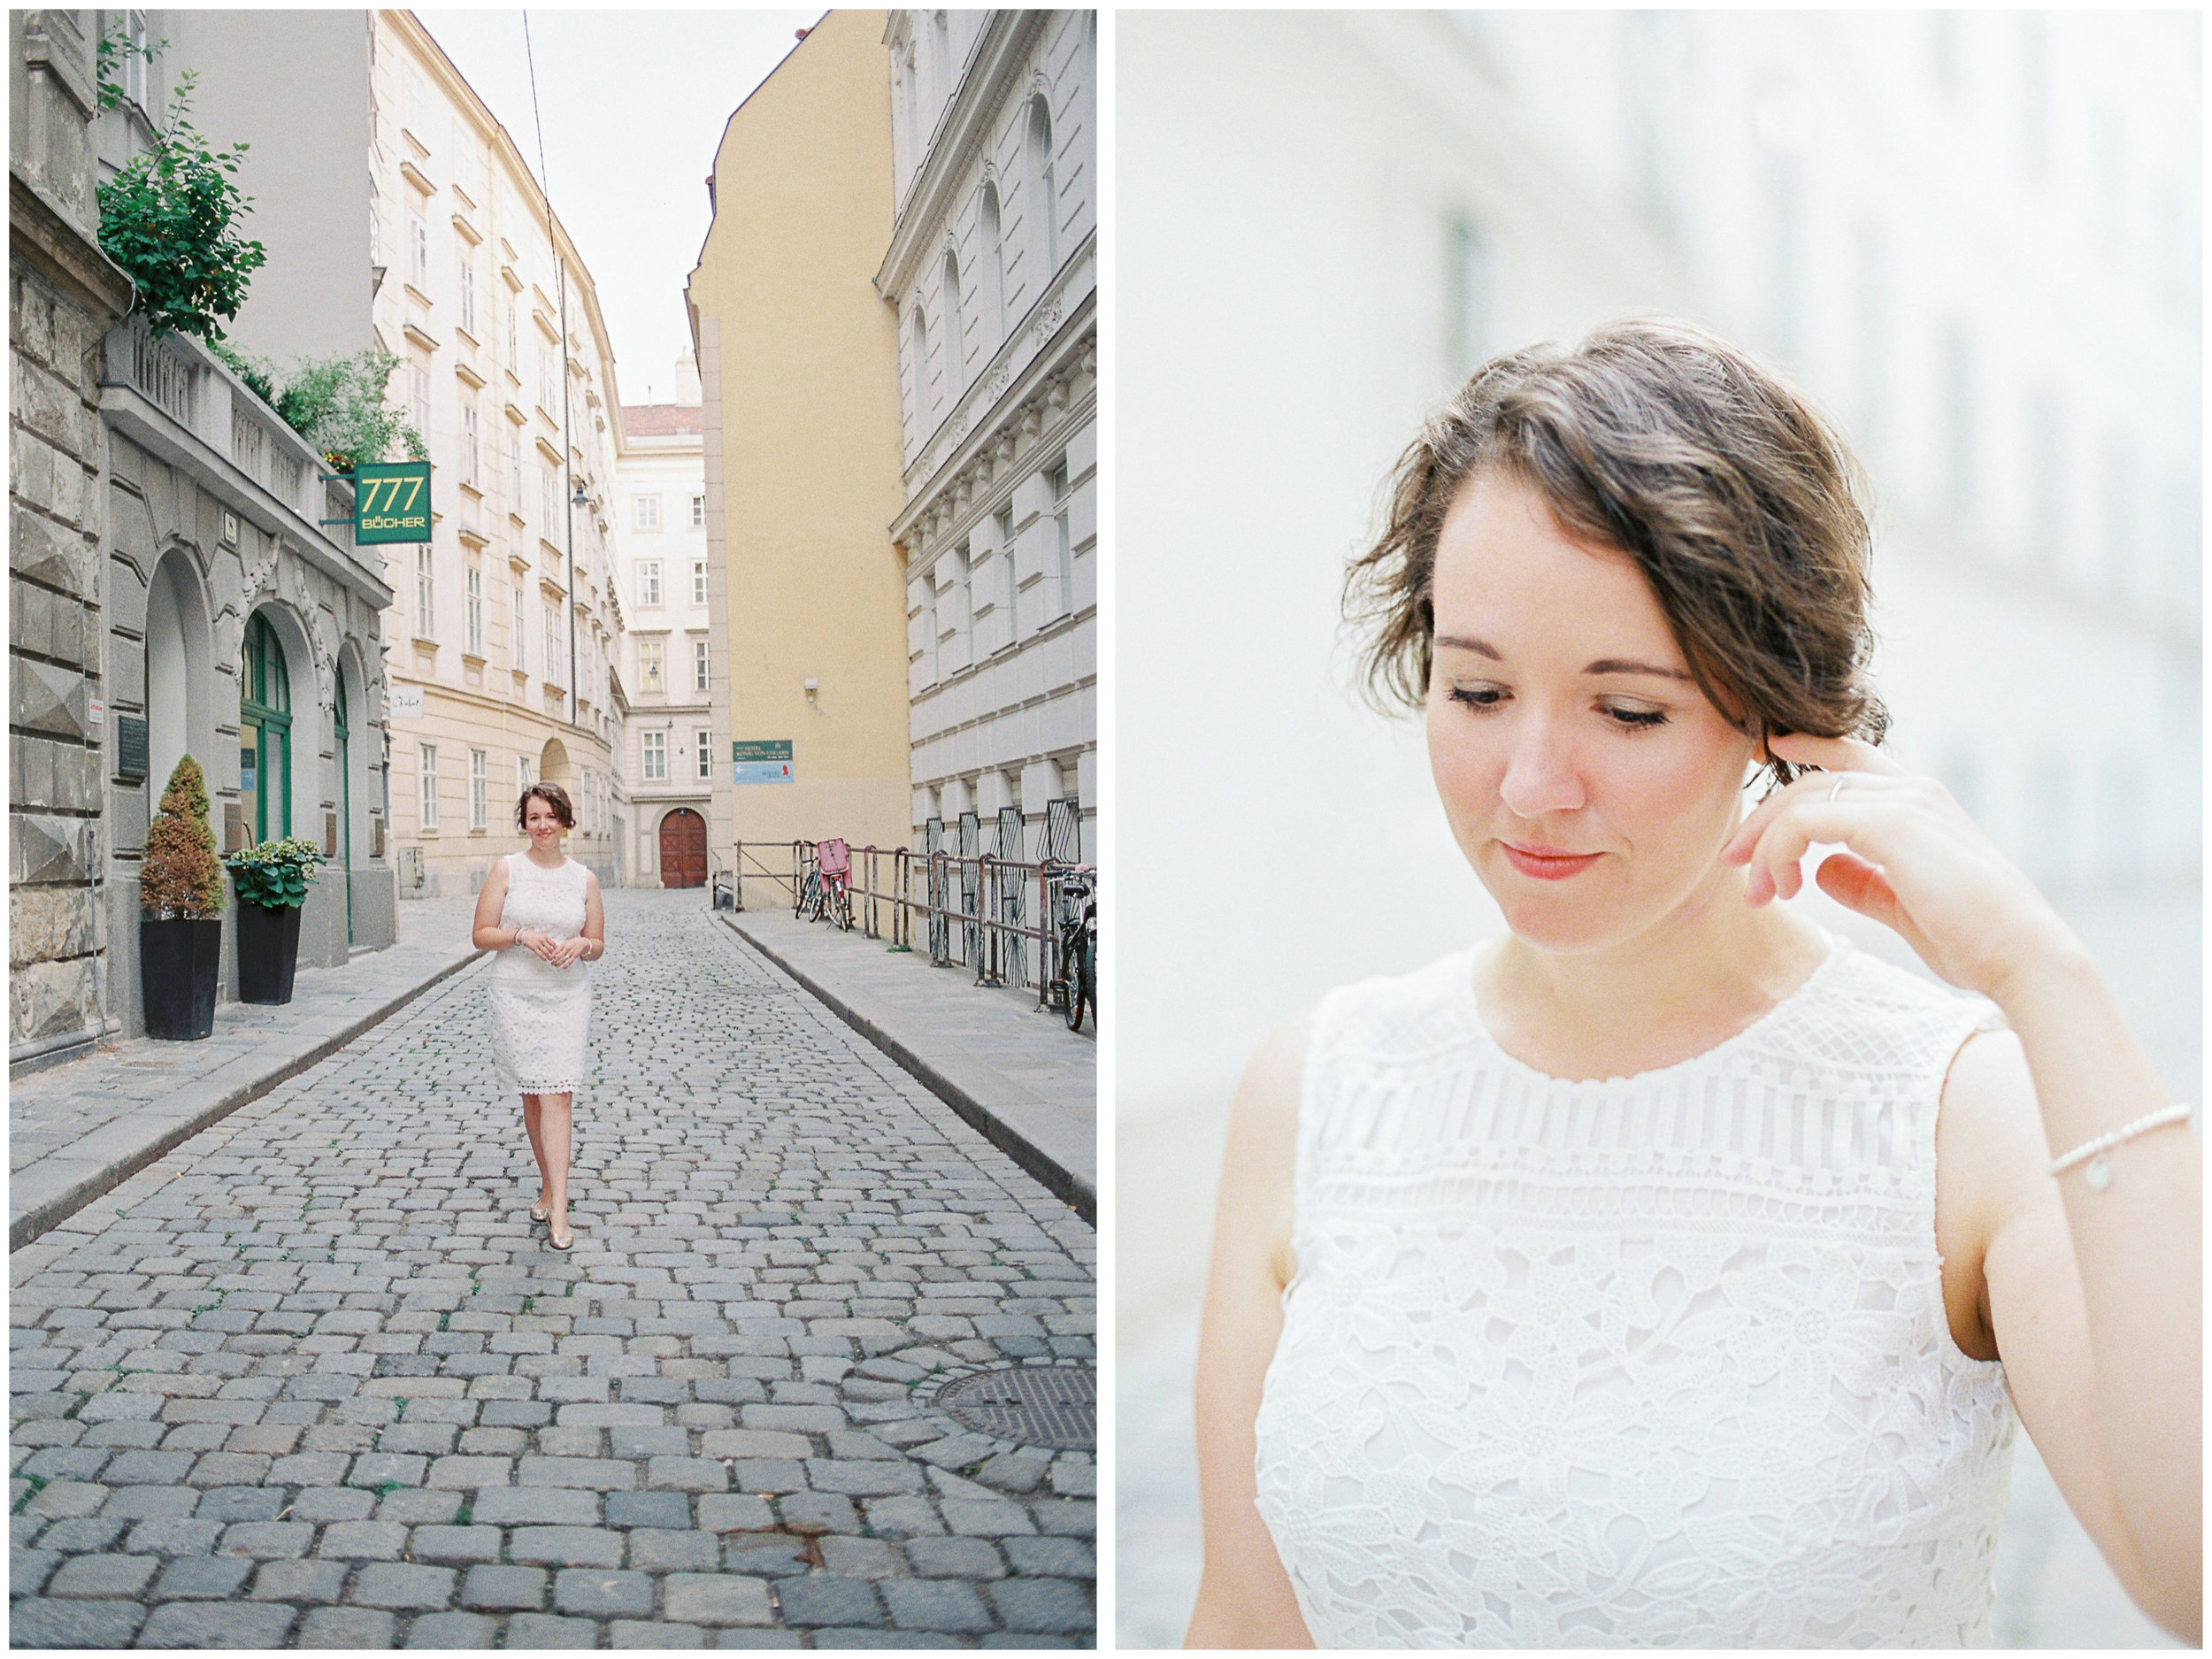 Blogger Portraits | Stephansplatz, Vienna | Michelle Mock Photography | Vienna Photographer | Canon 1V | Fuji400H